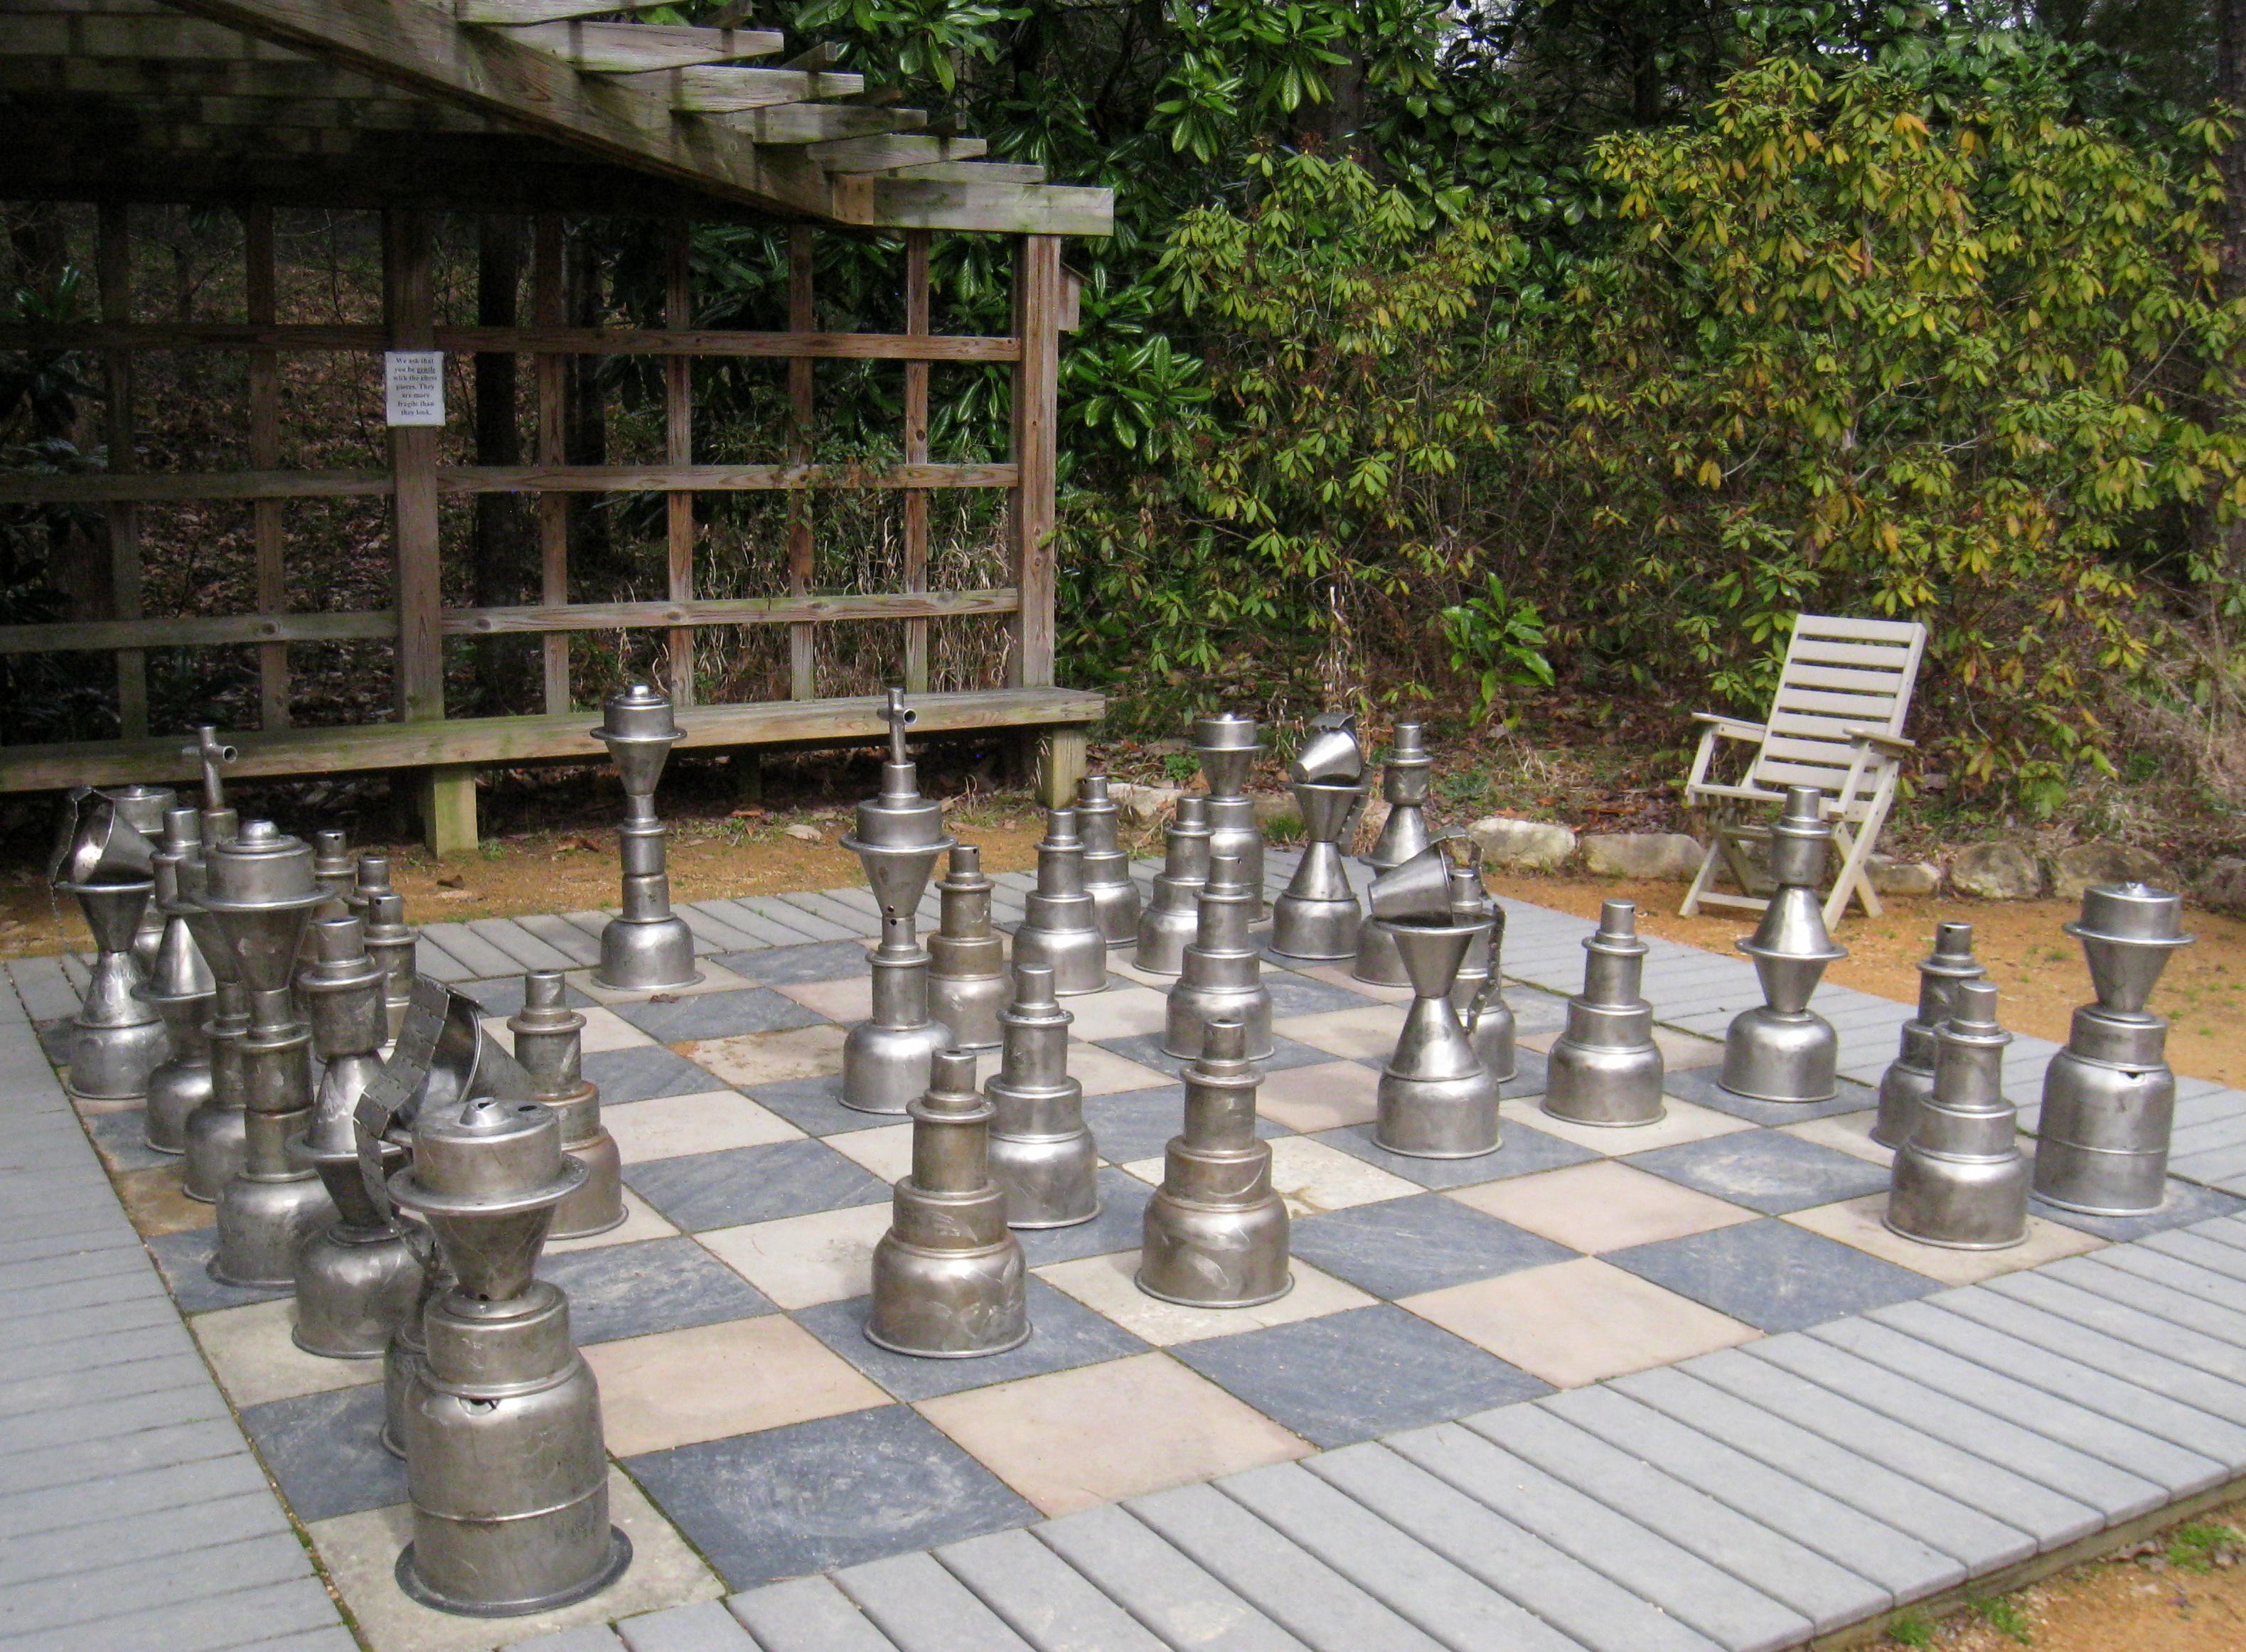 Delicieux File:North Carolina Botanical Garden   March 15, 2010   IMG 4947.JPG